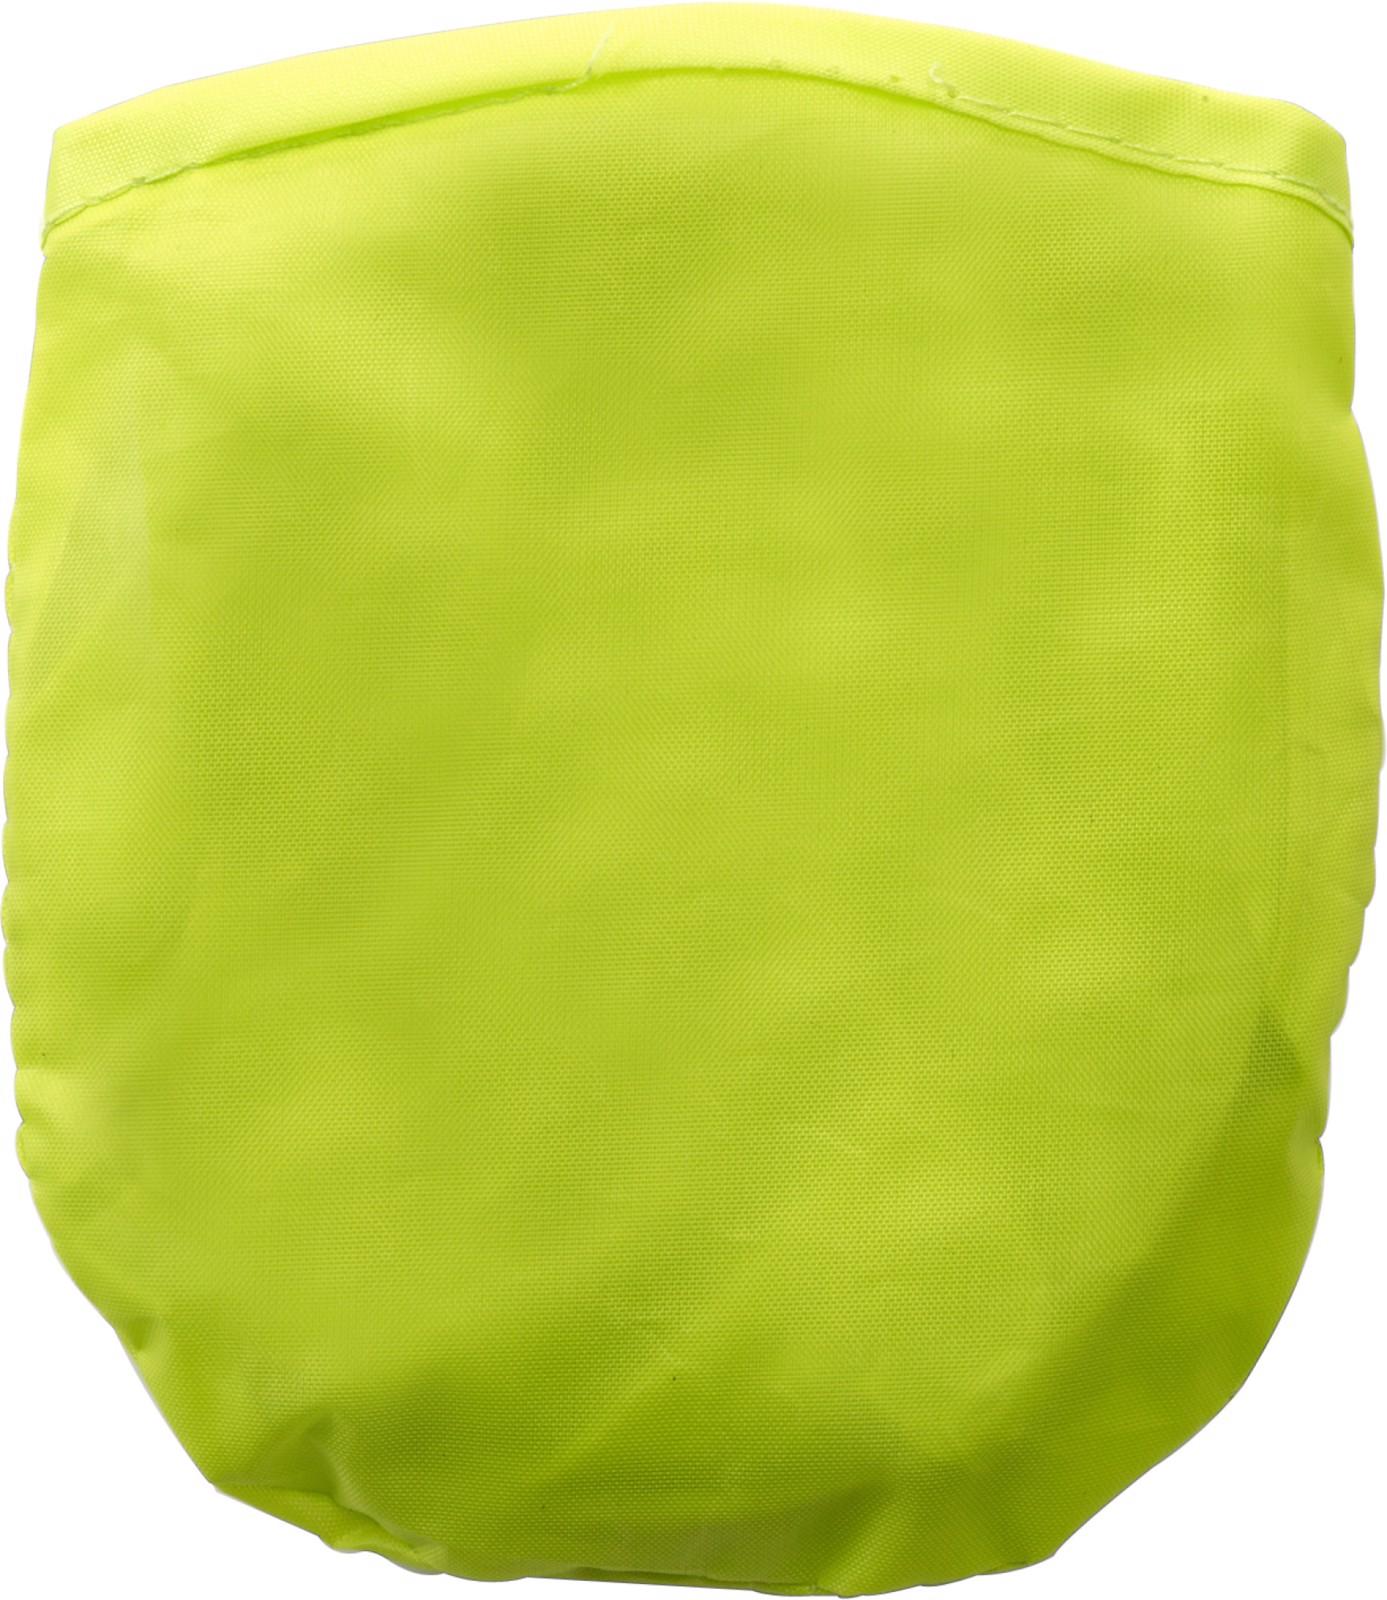 Foldable cap - Light Green